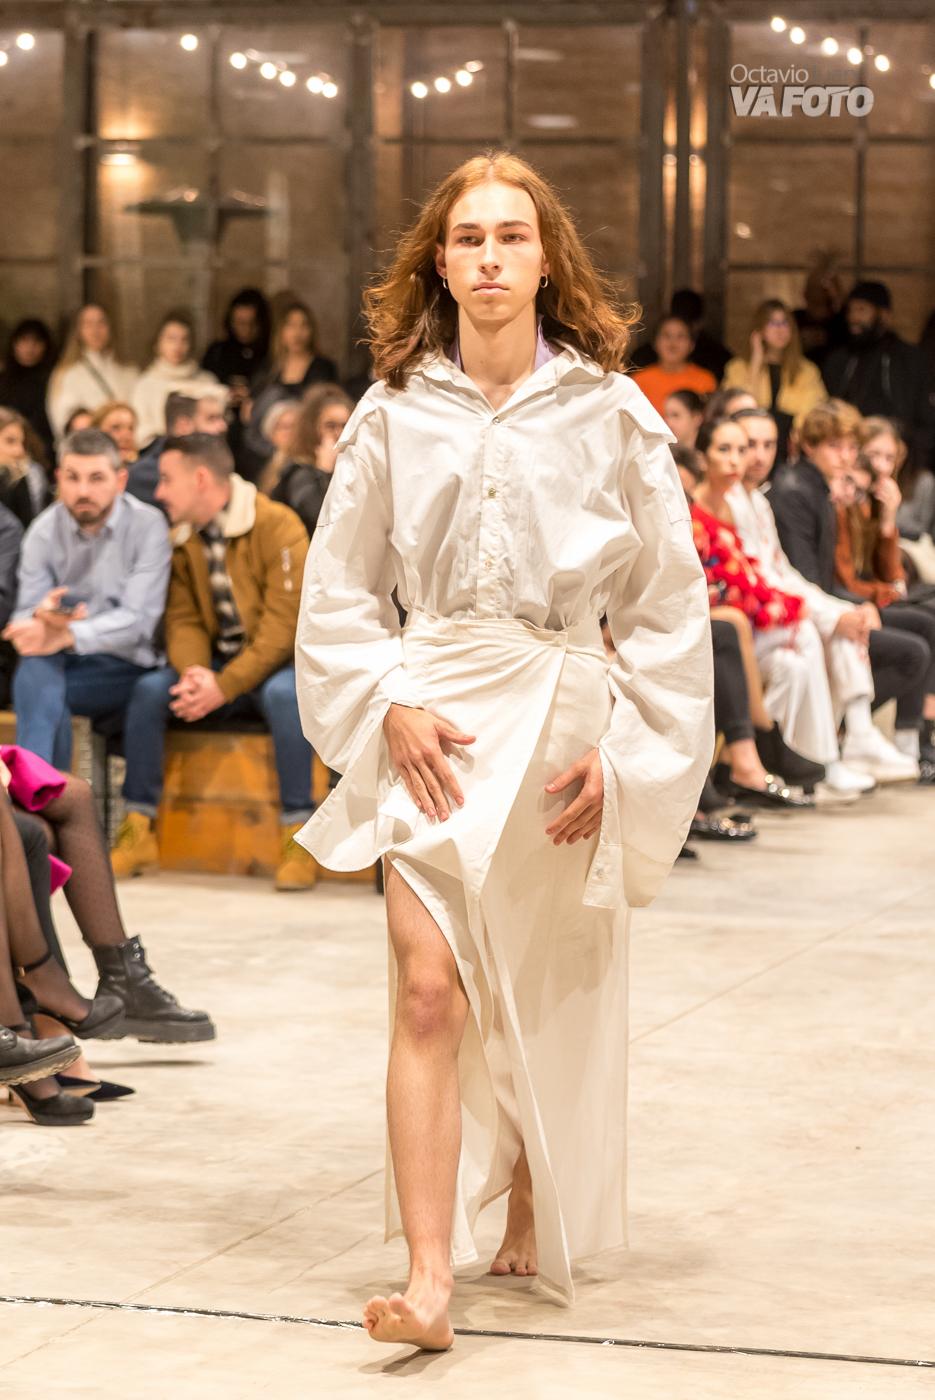 00188 ARTEMODA DSC4287 20181124 - Evento: Arte + Moda Valencia